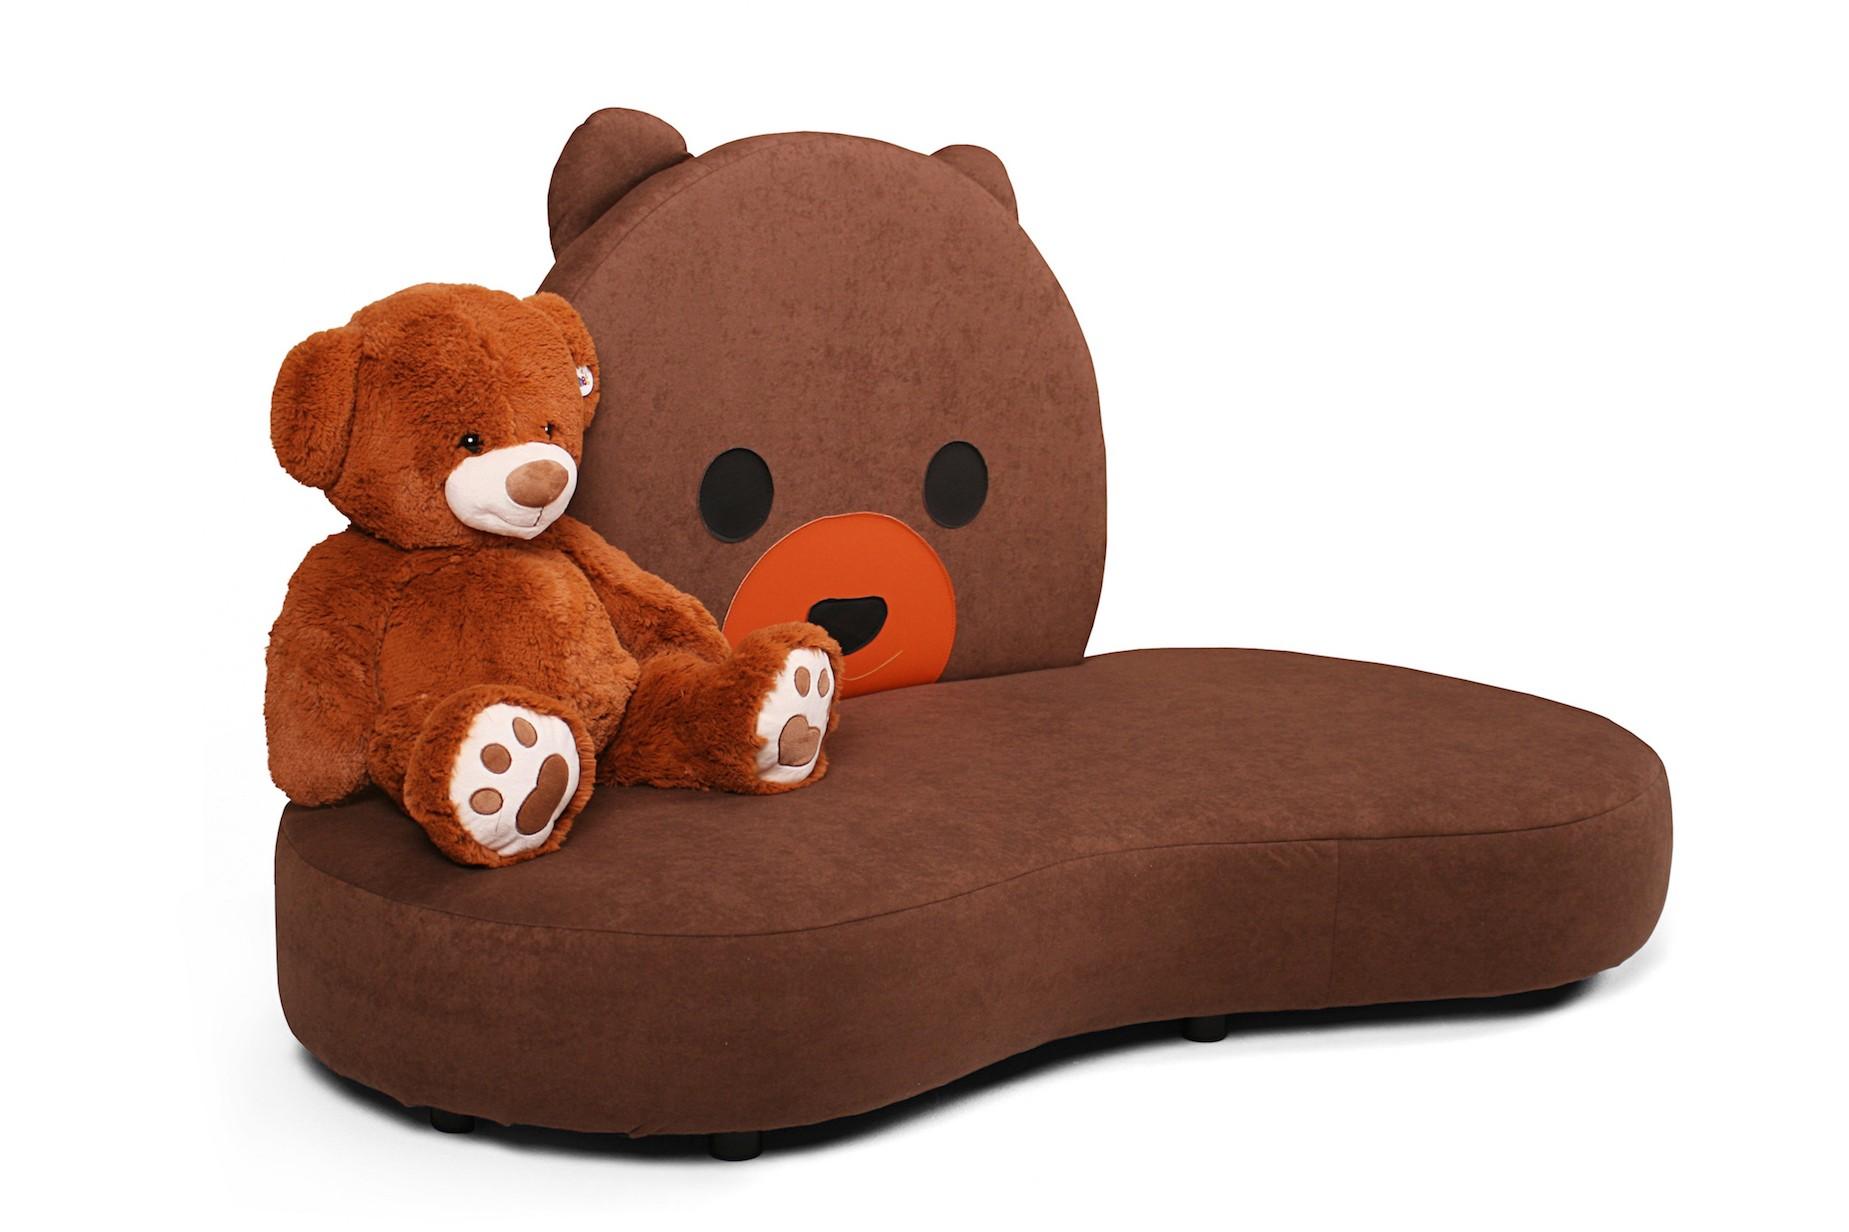 kindersofa mit teddy motiv kuschelinsel kinic kindersofas. Black Bedroom Furniture Sets. Home Design Ideas